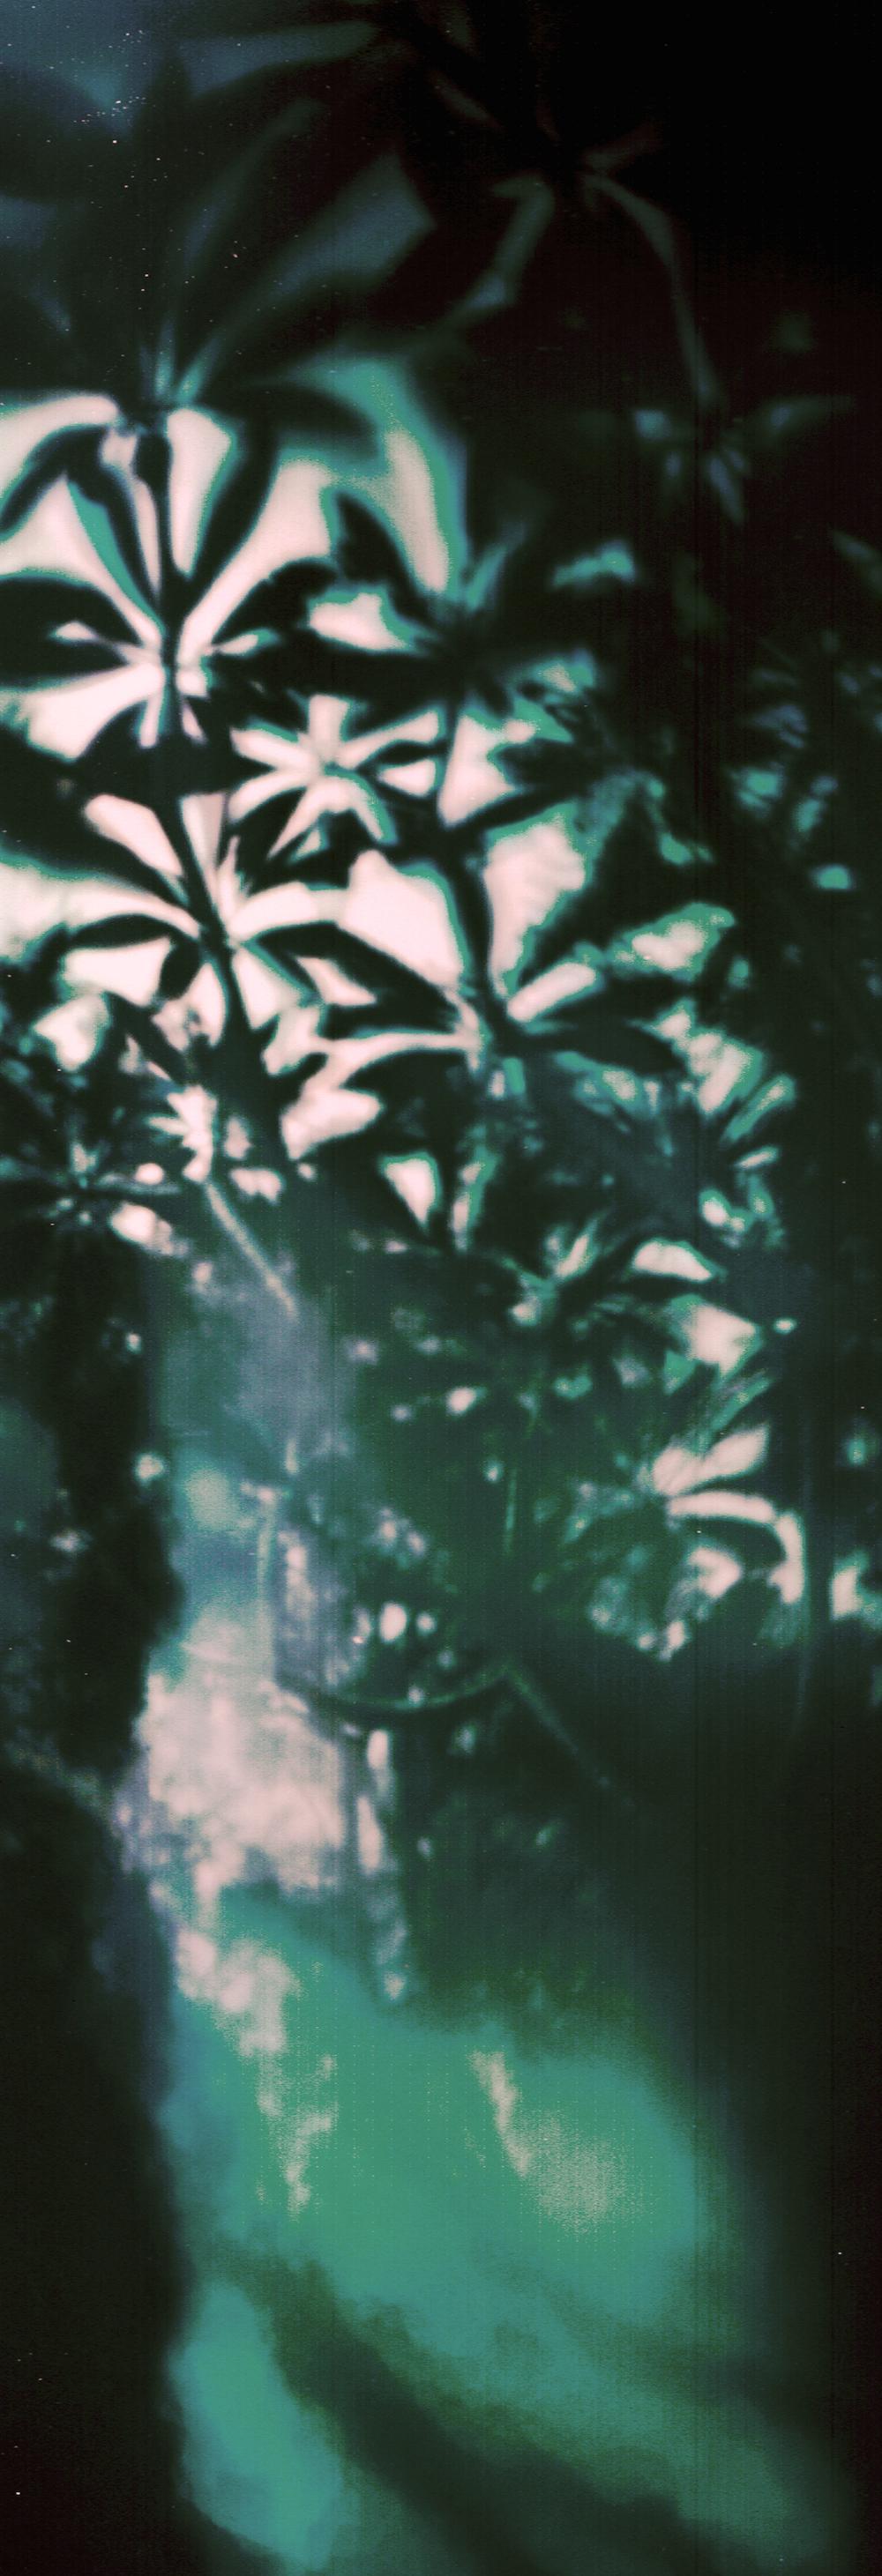 17 Days In A Frangipani Tree